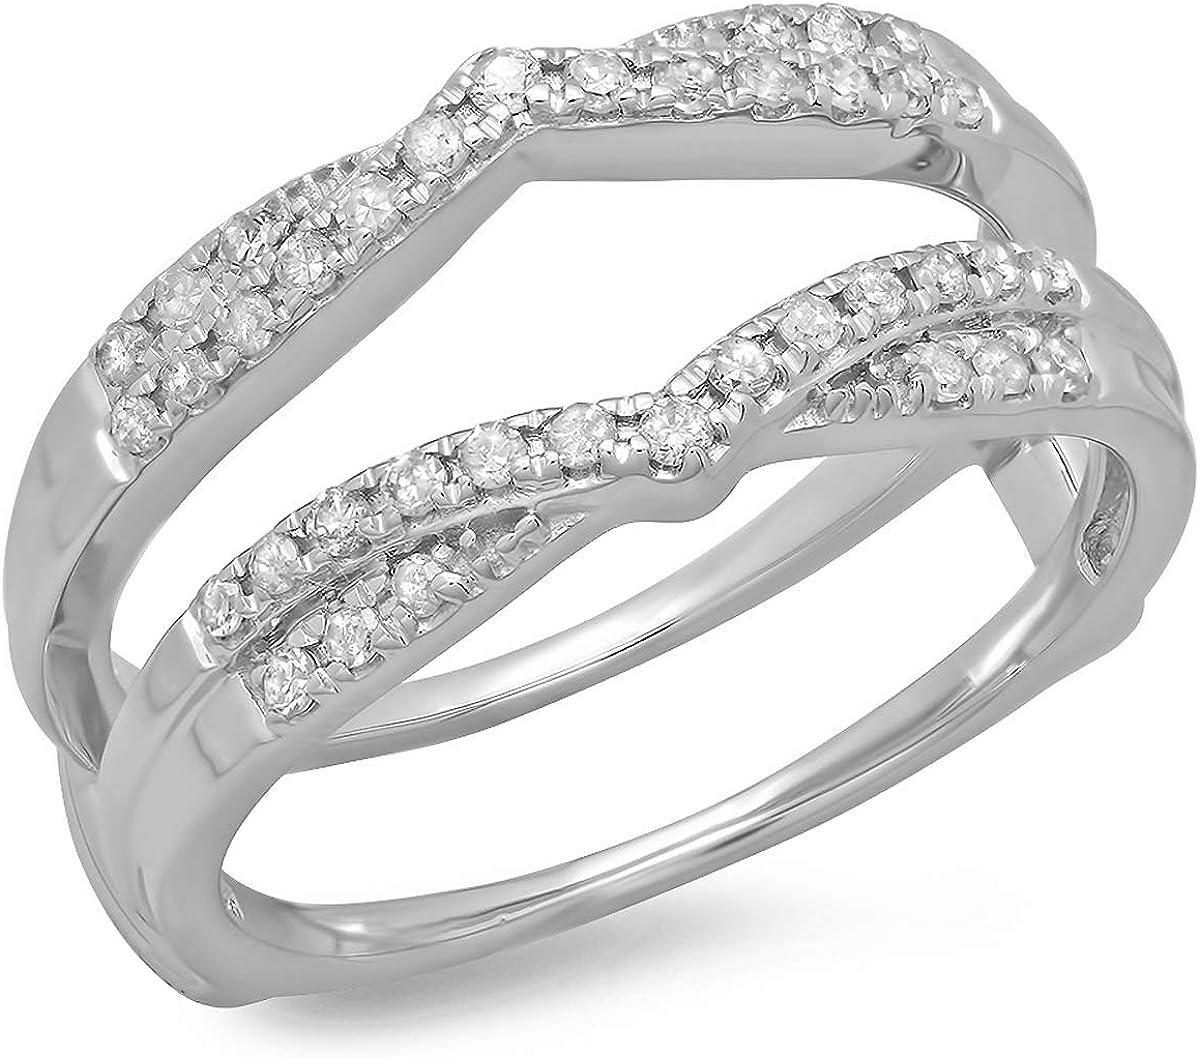 0.33 Carat ctw 14K Gold Round Band 5% Max 47% OFF OFF Wedding Enha Ladies Diamond